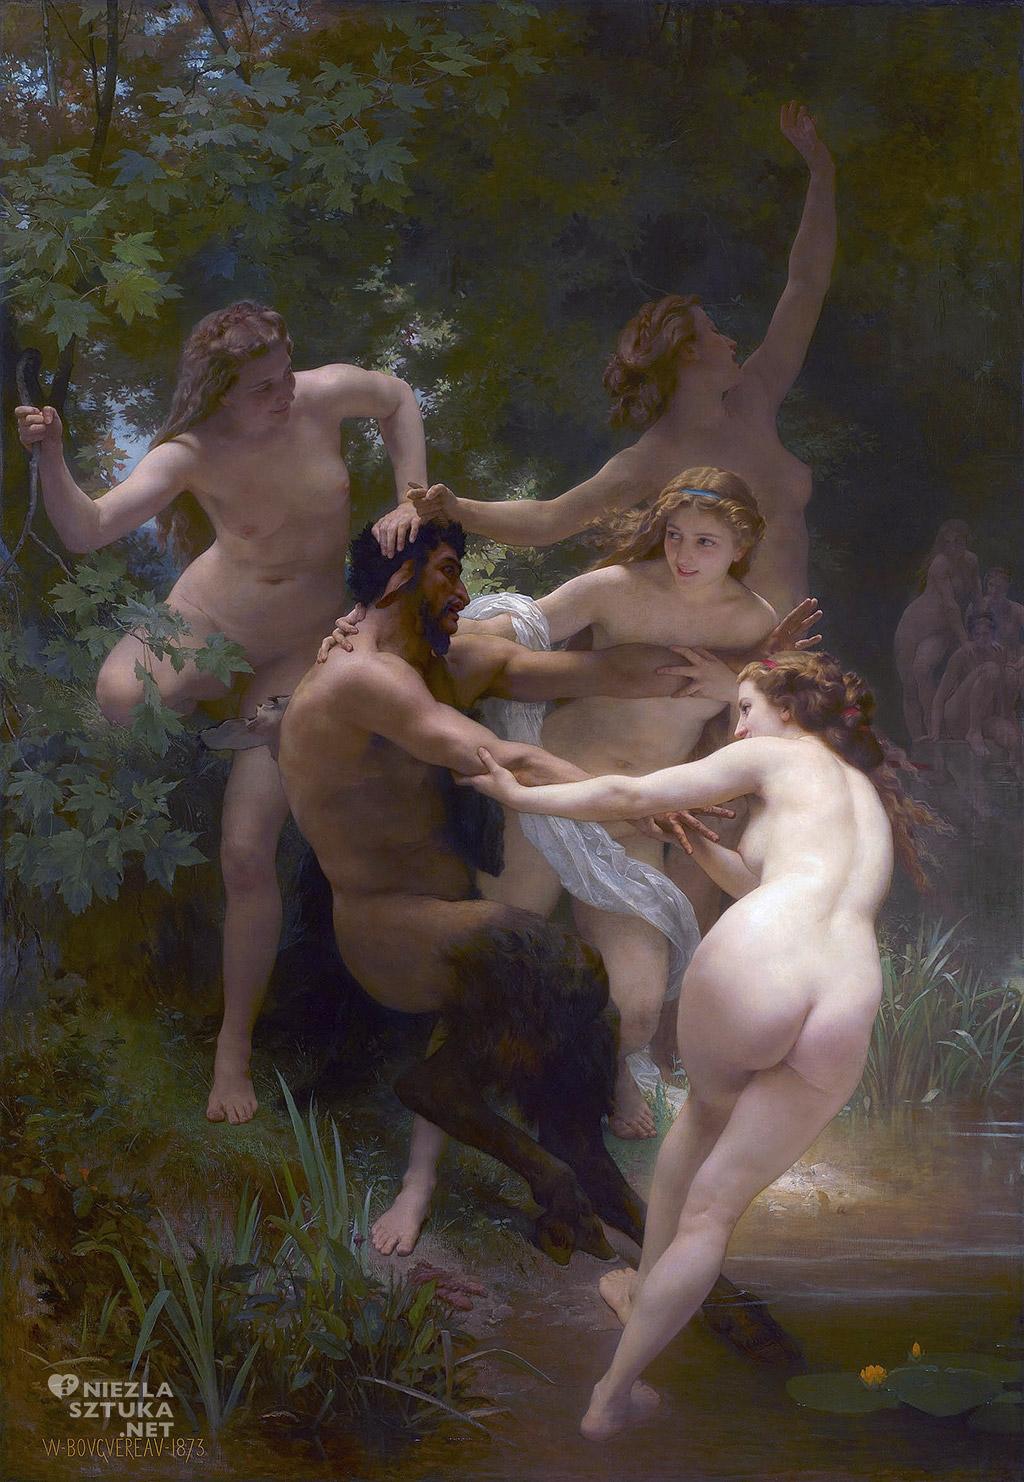 William Adolphe Bouguereau <em>Nimfy i satyr</em>   1873,<br /> olej na płótnie, 260 × 180 cm, Clark Art Institute